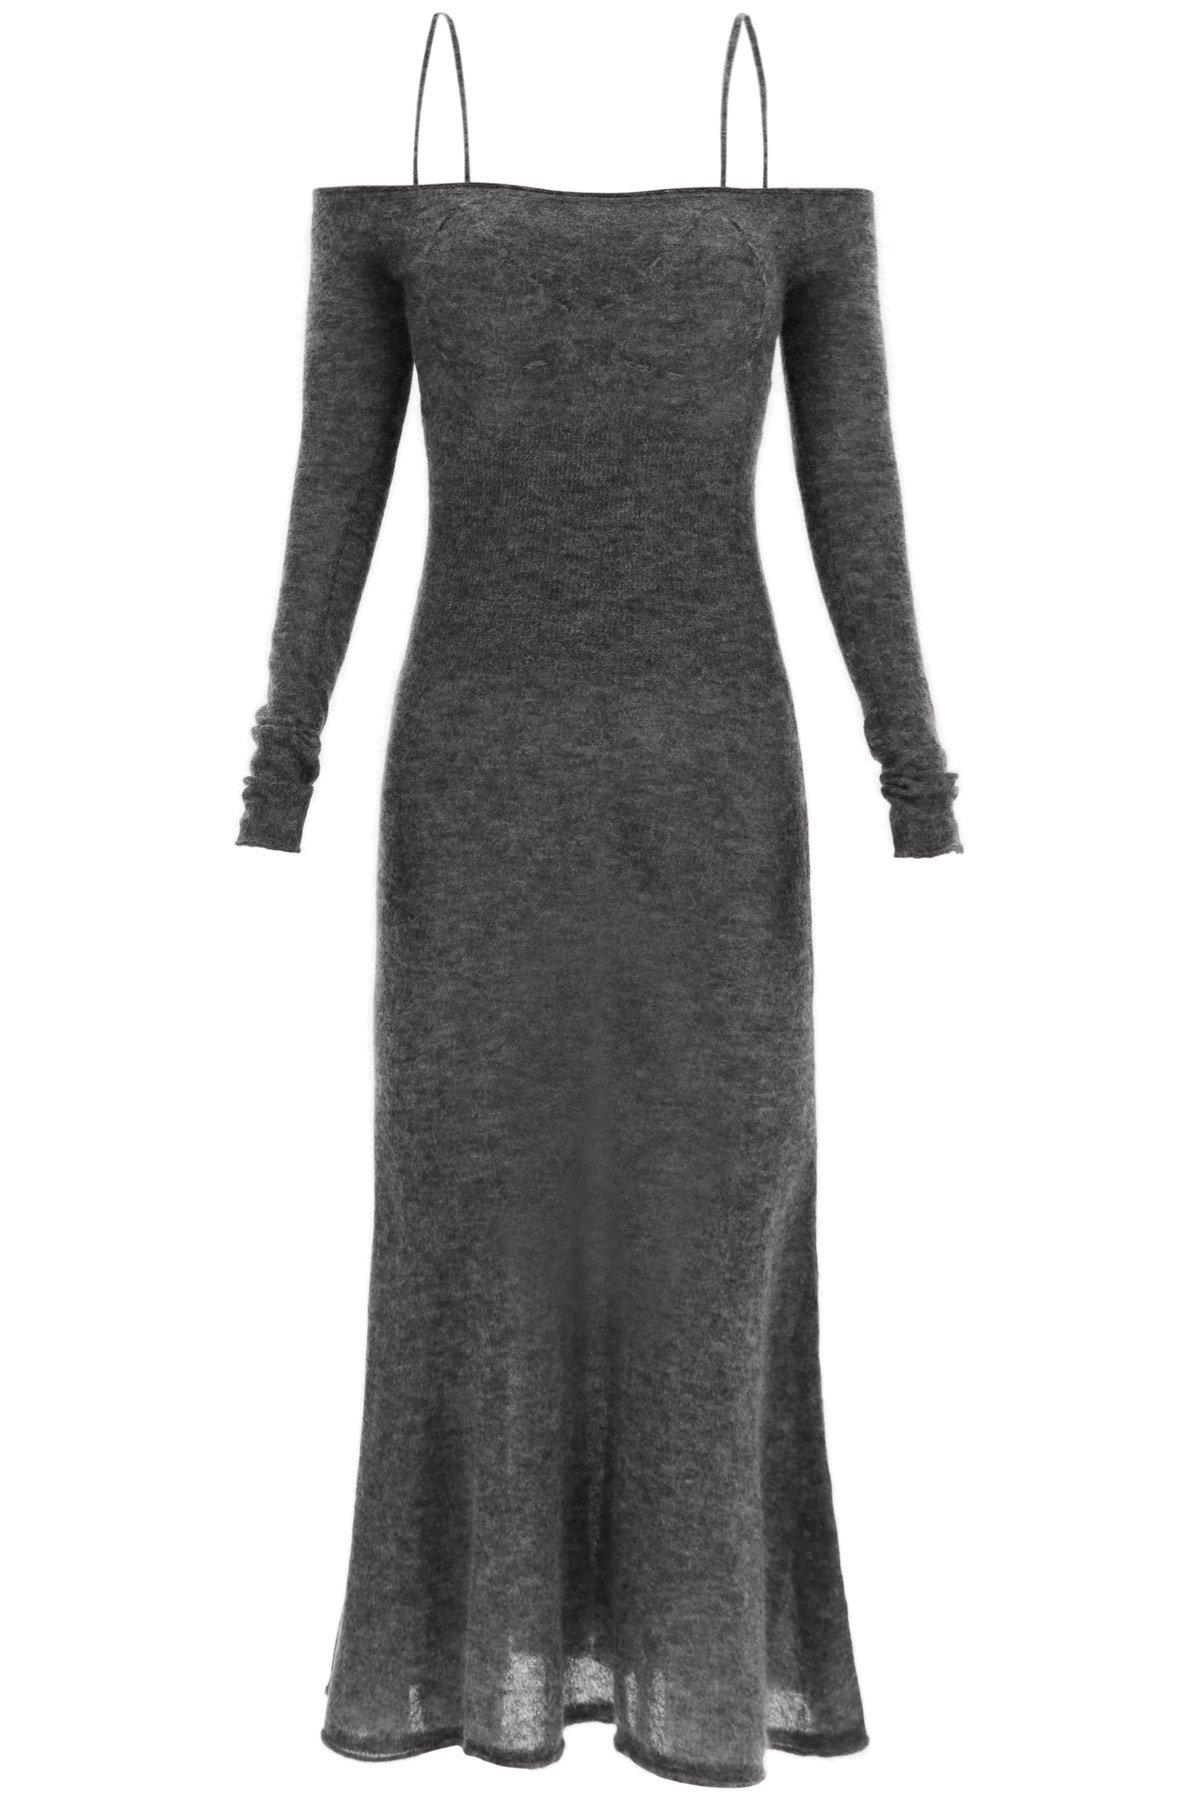 Jacquemus abito la robe lauris